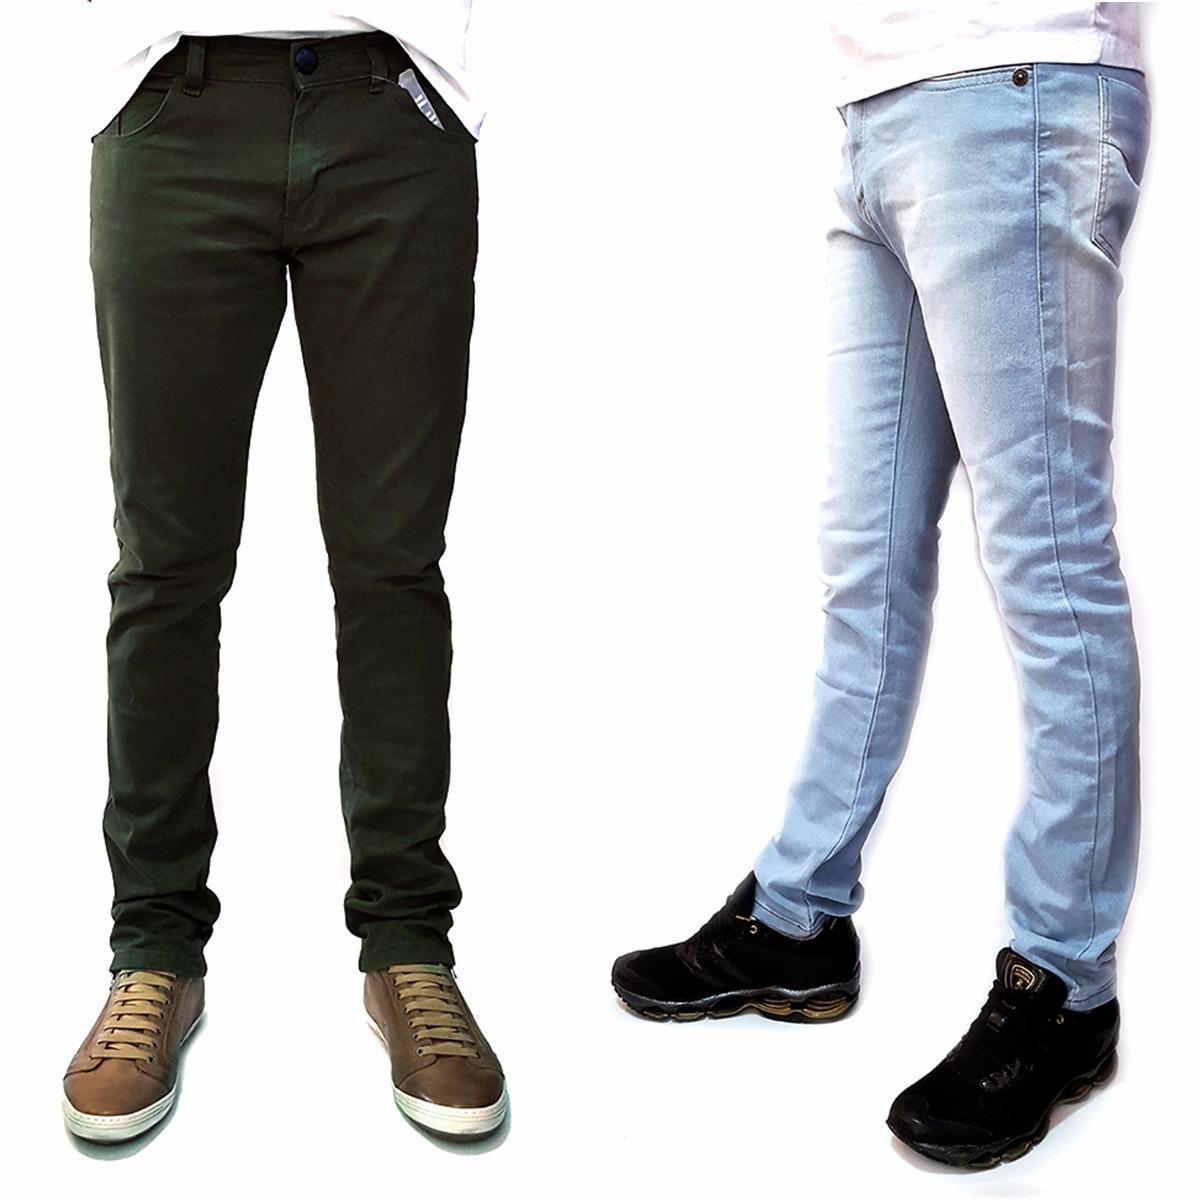 91f62c6d8 kit 2 calça masculina skinny lycra verde e agua premium. Carregando zoom.